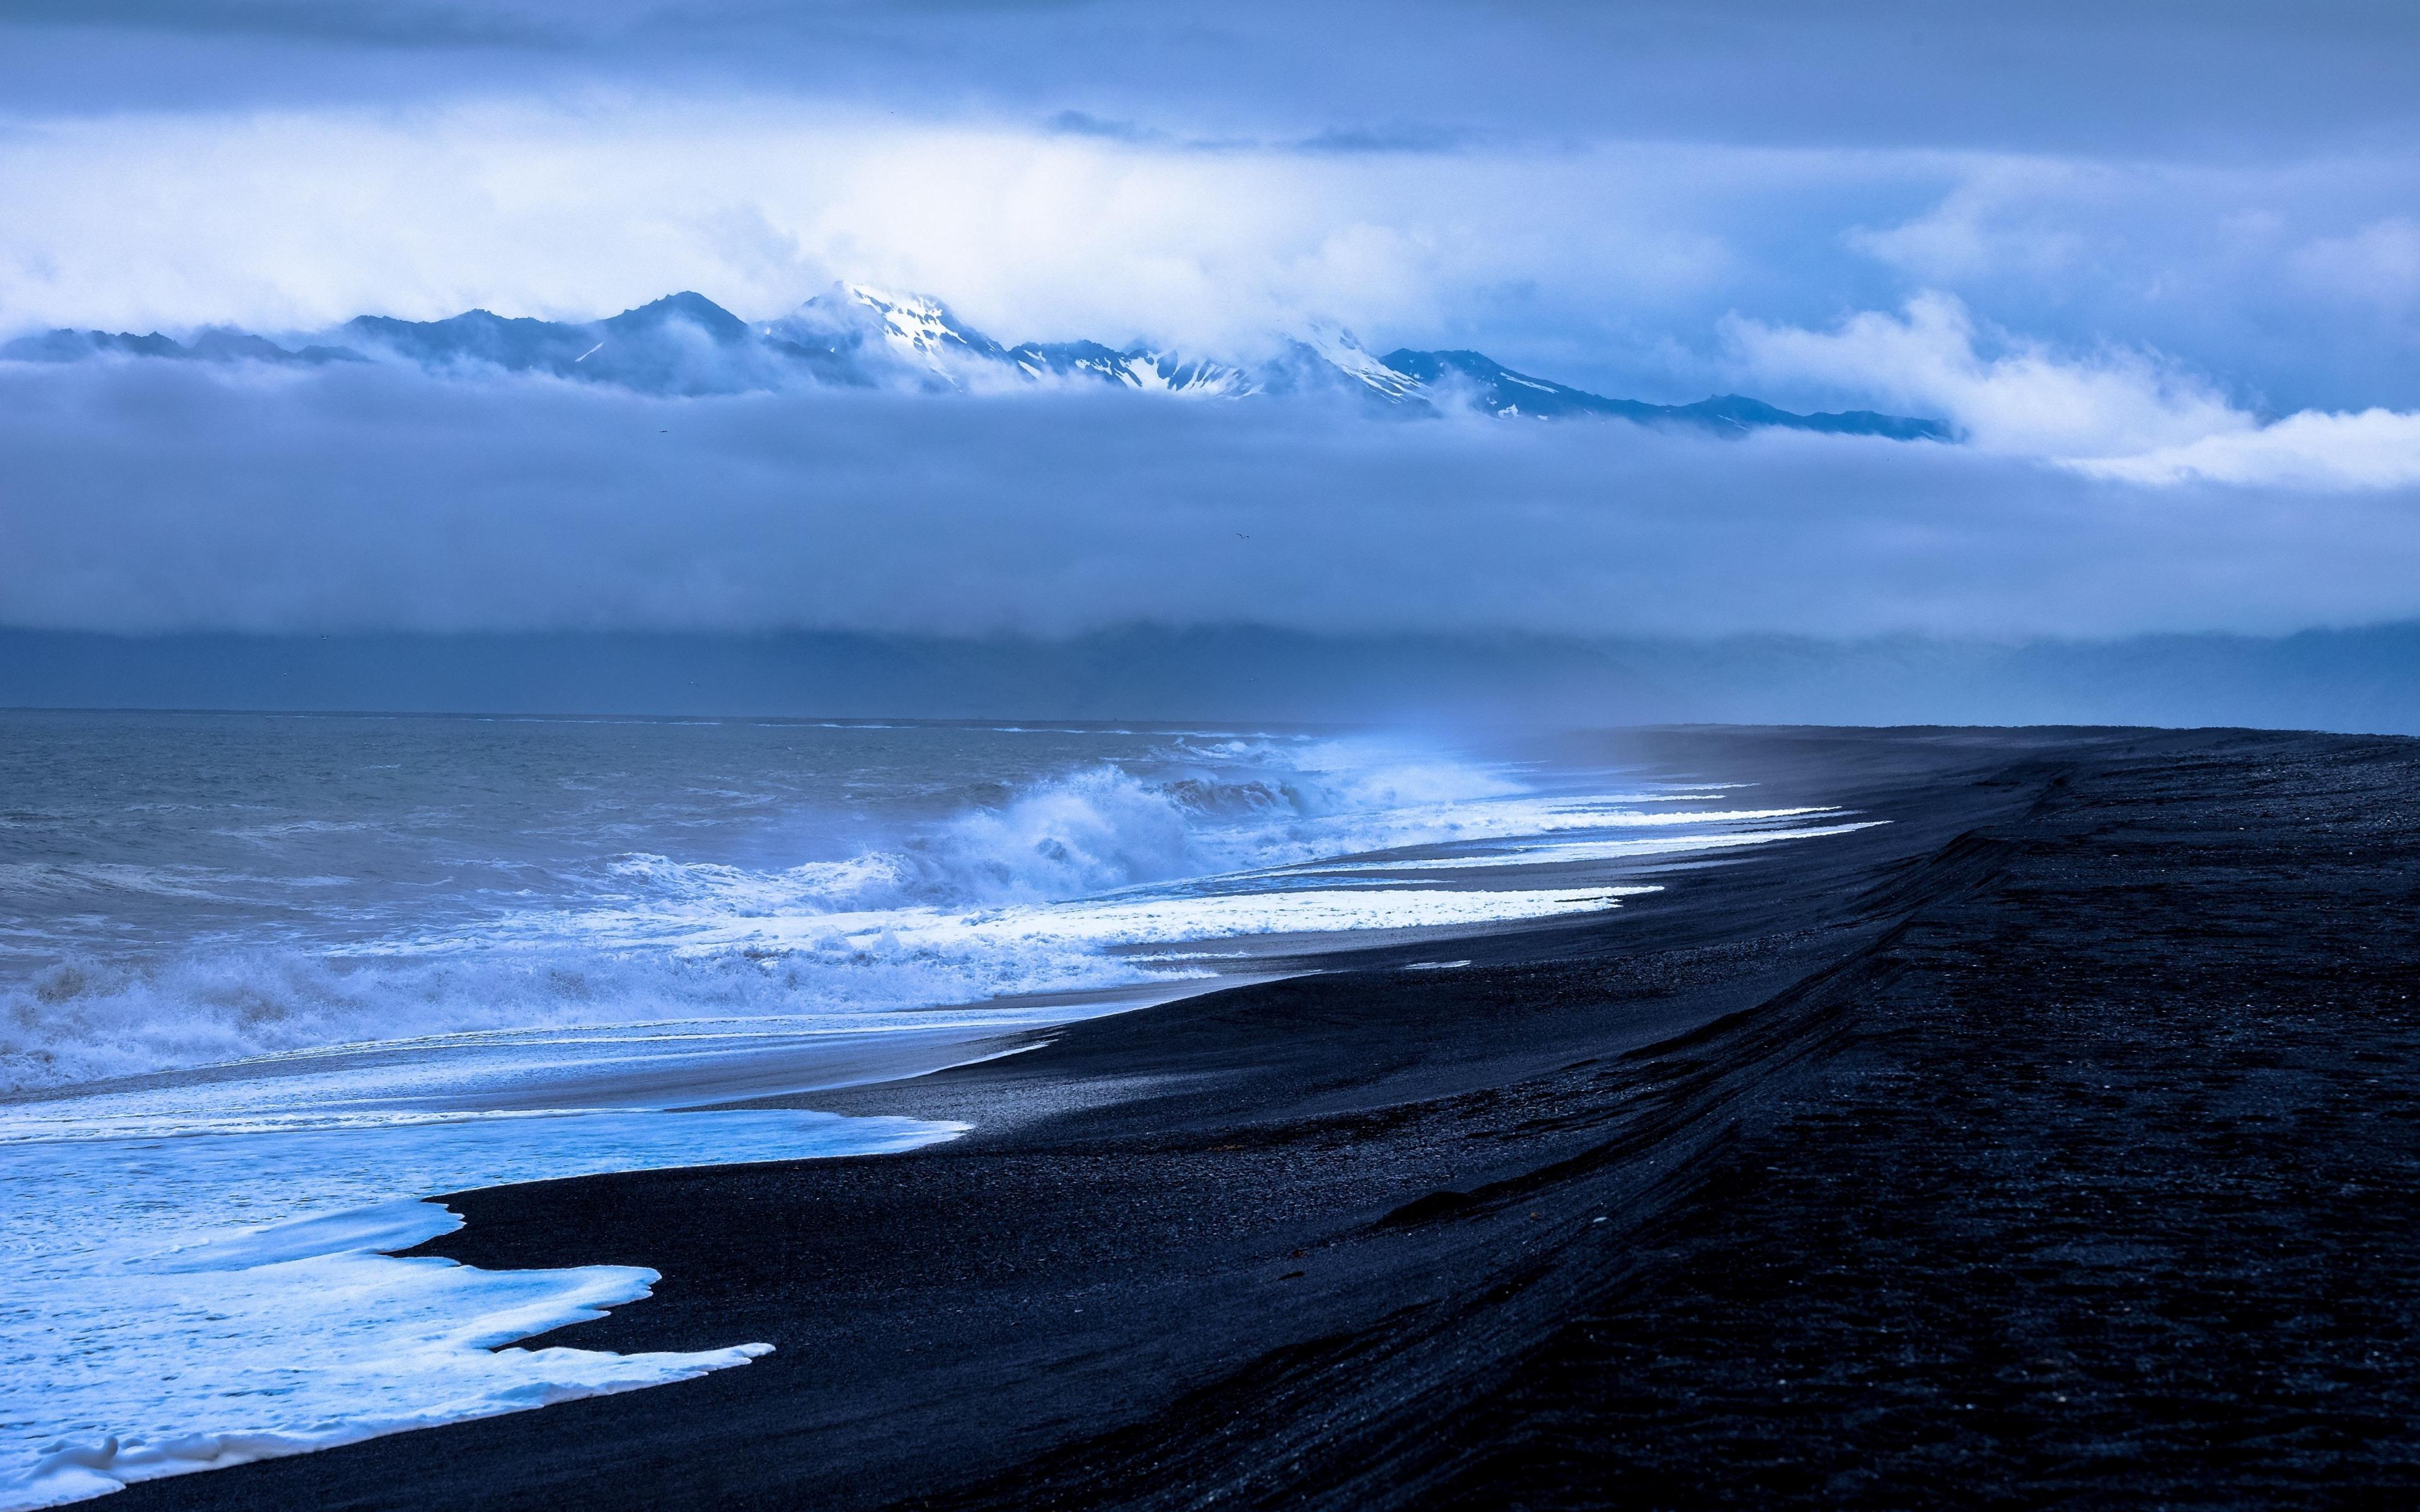 Download 3840x2400 Wallpaper Black Beach Clouds Sea Waves Nature 4k Ultra Hd 16 10 Widescreen 3840x2400 Hd Image Background 18260